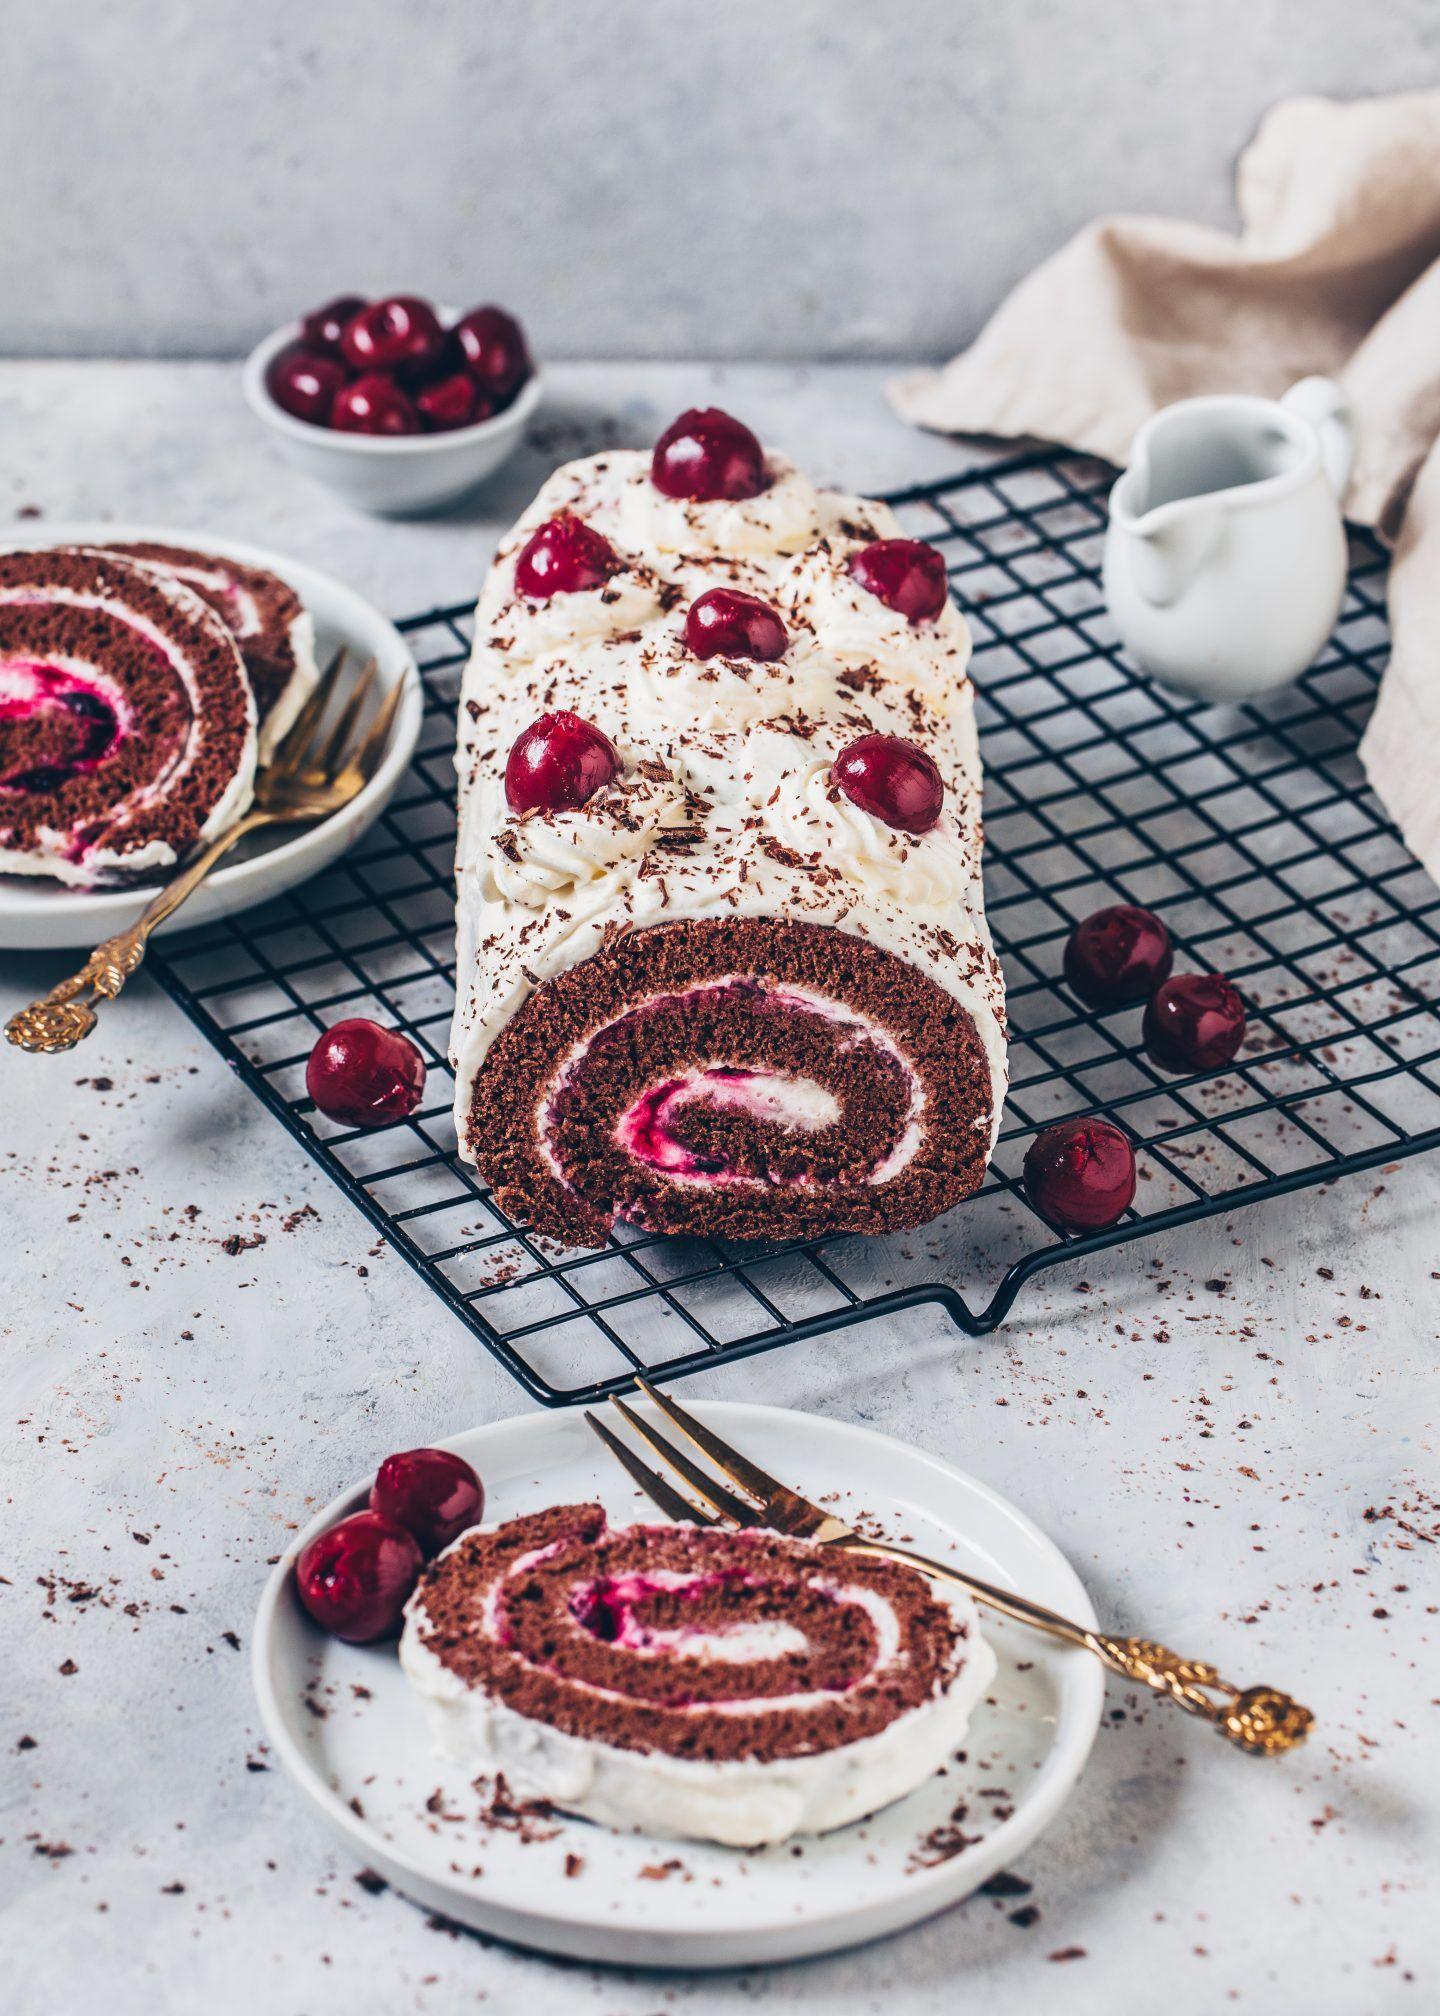 Vegane Schoko Biskuitrolle Schwarzwalder Kirsch Recipe Black Forest Cake Chocolate Yule Log Recipe Chocolate Roll Cake